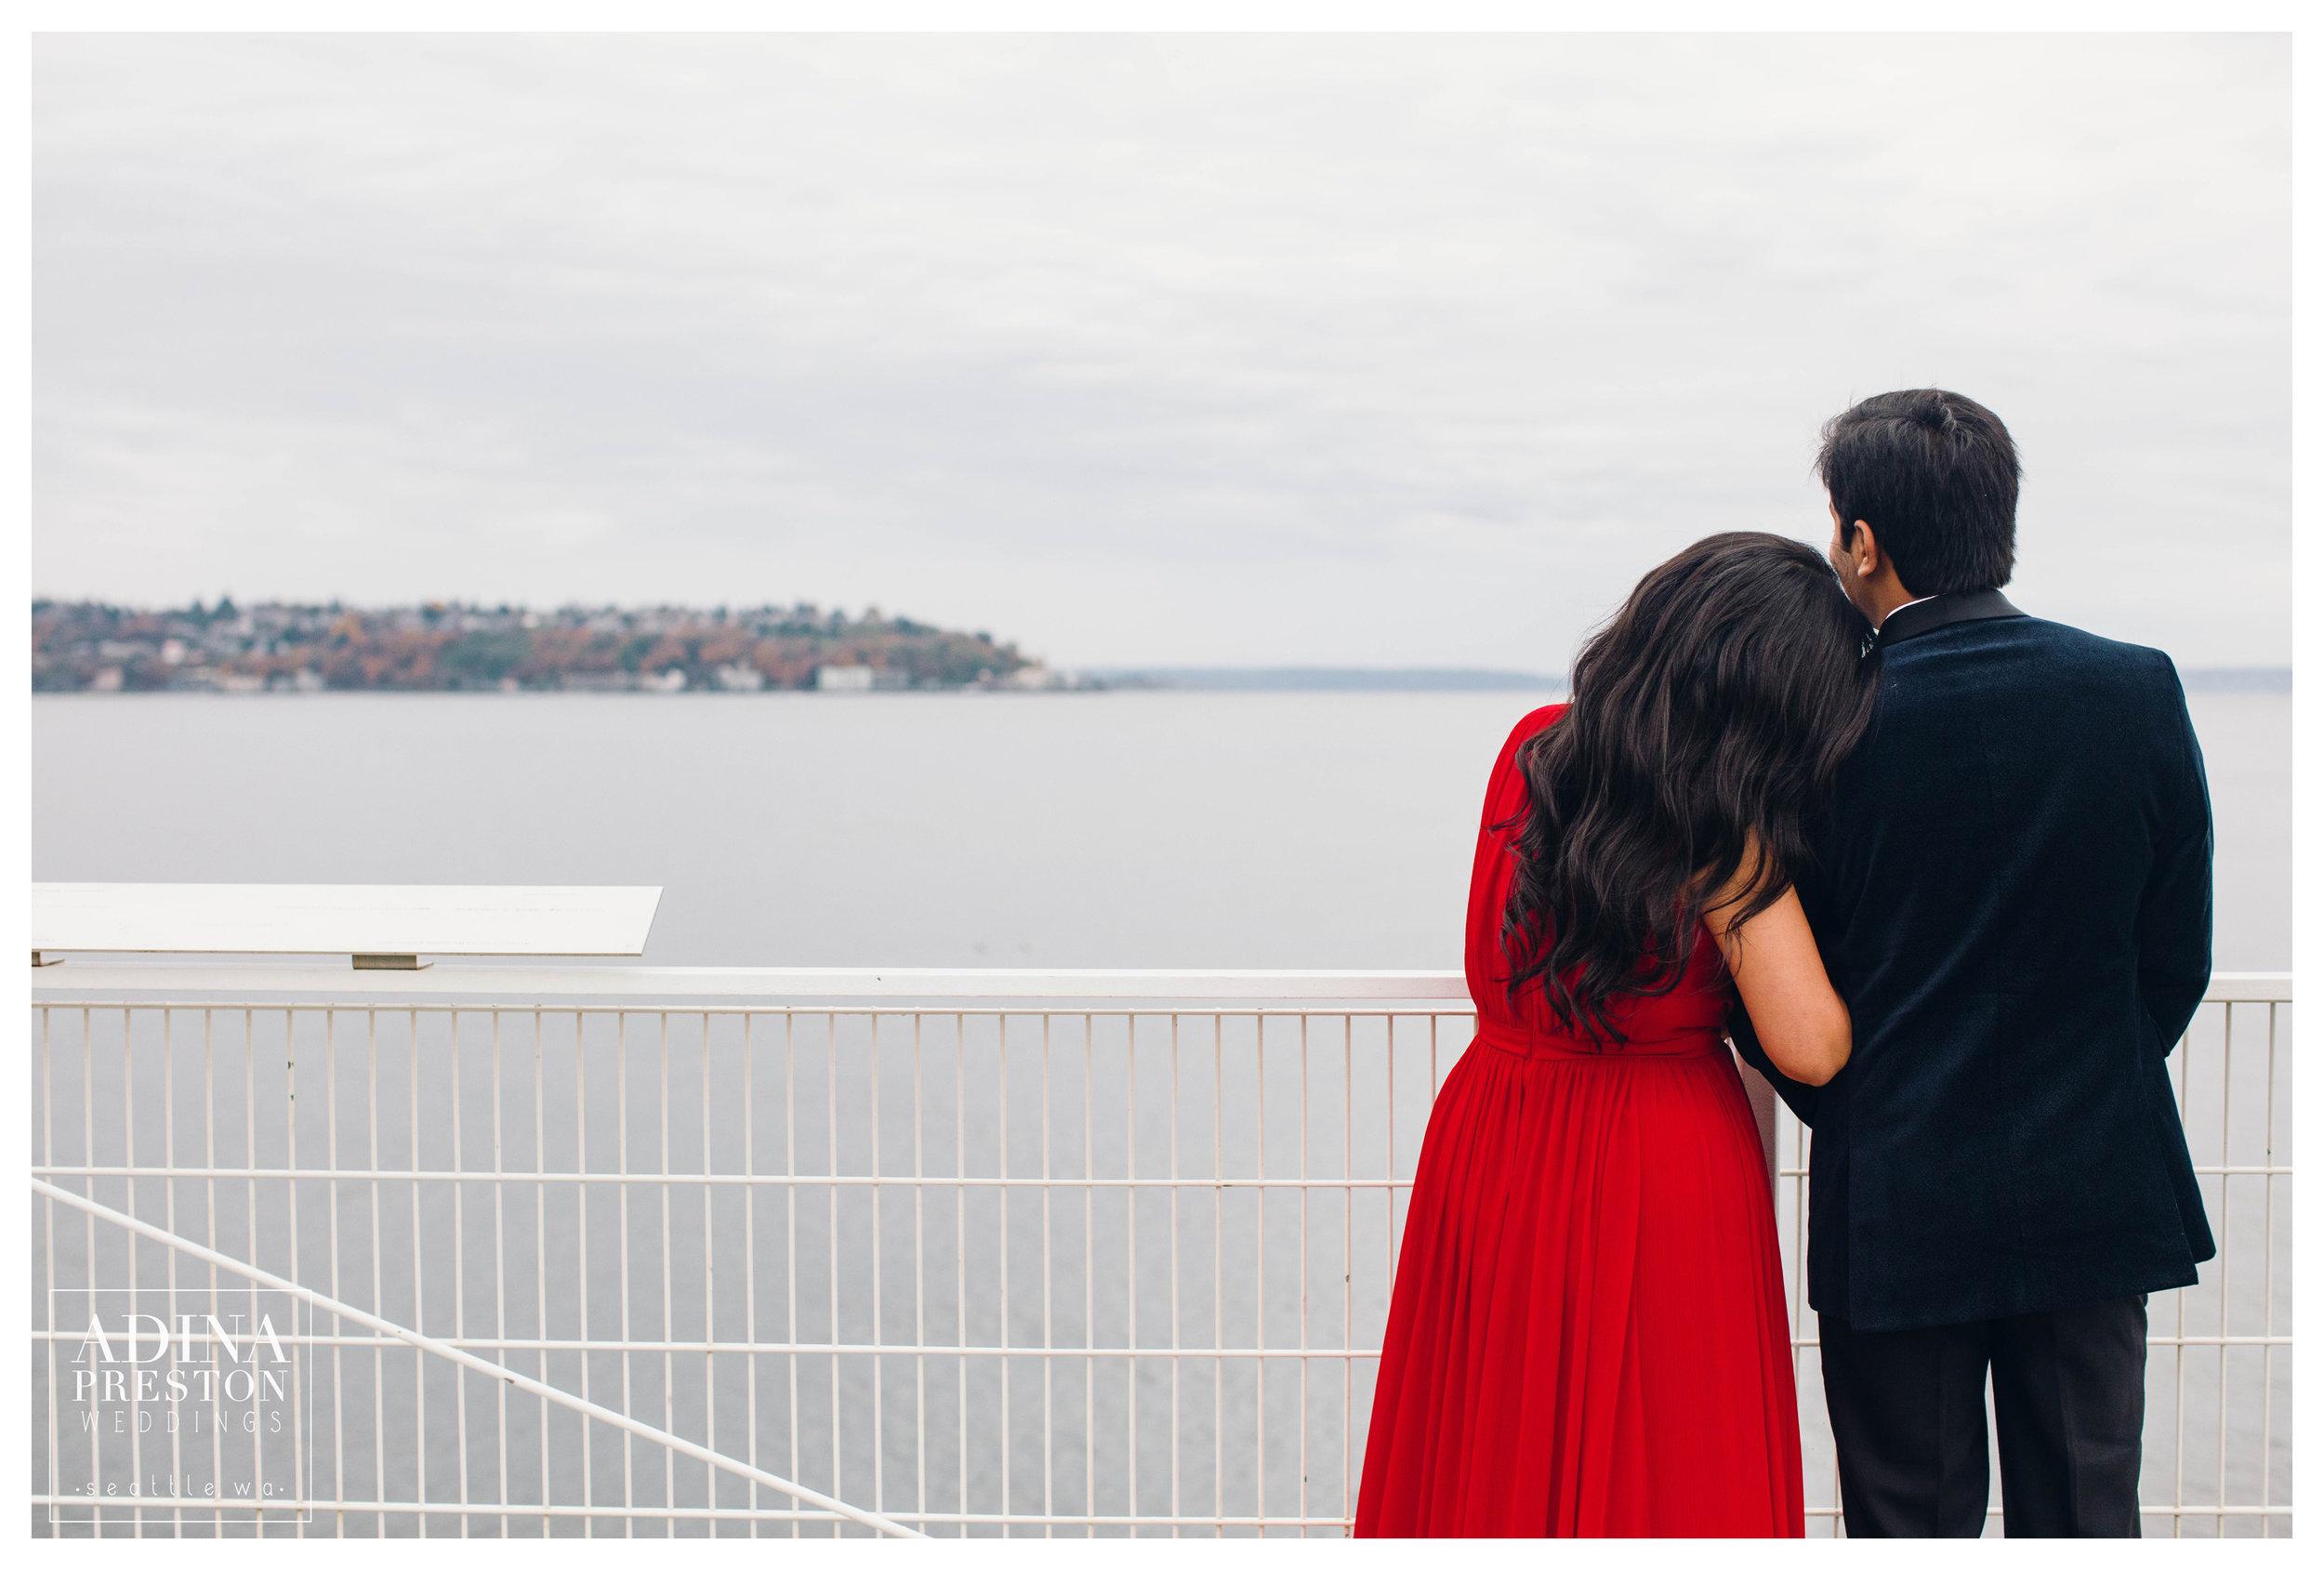 Nancy+Sushat_Engagement_Pioneer+Square_Seattle+Wedding+Photographer_3.jpg